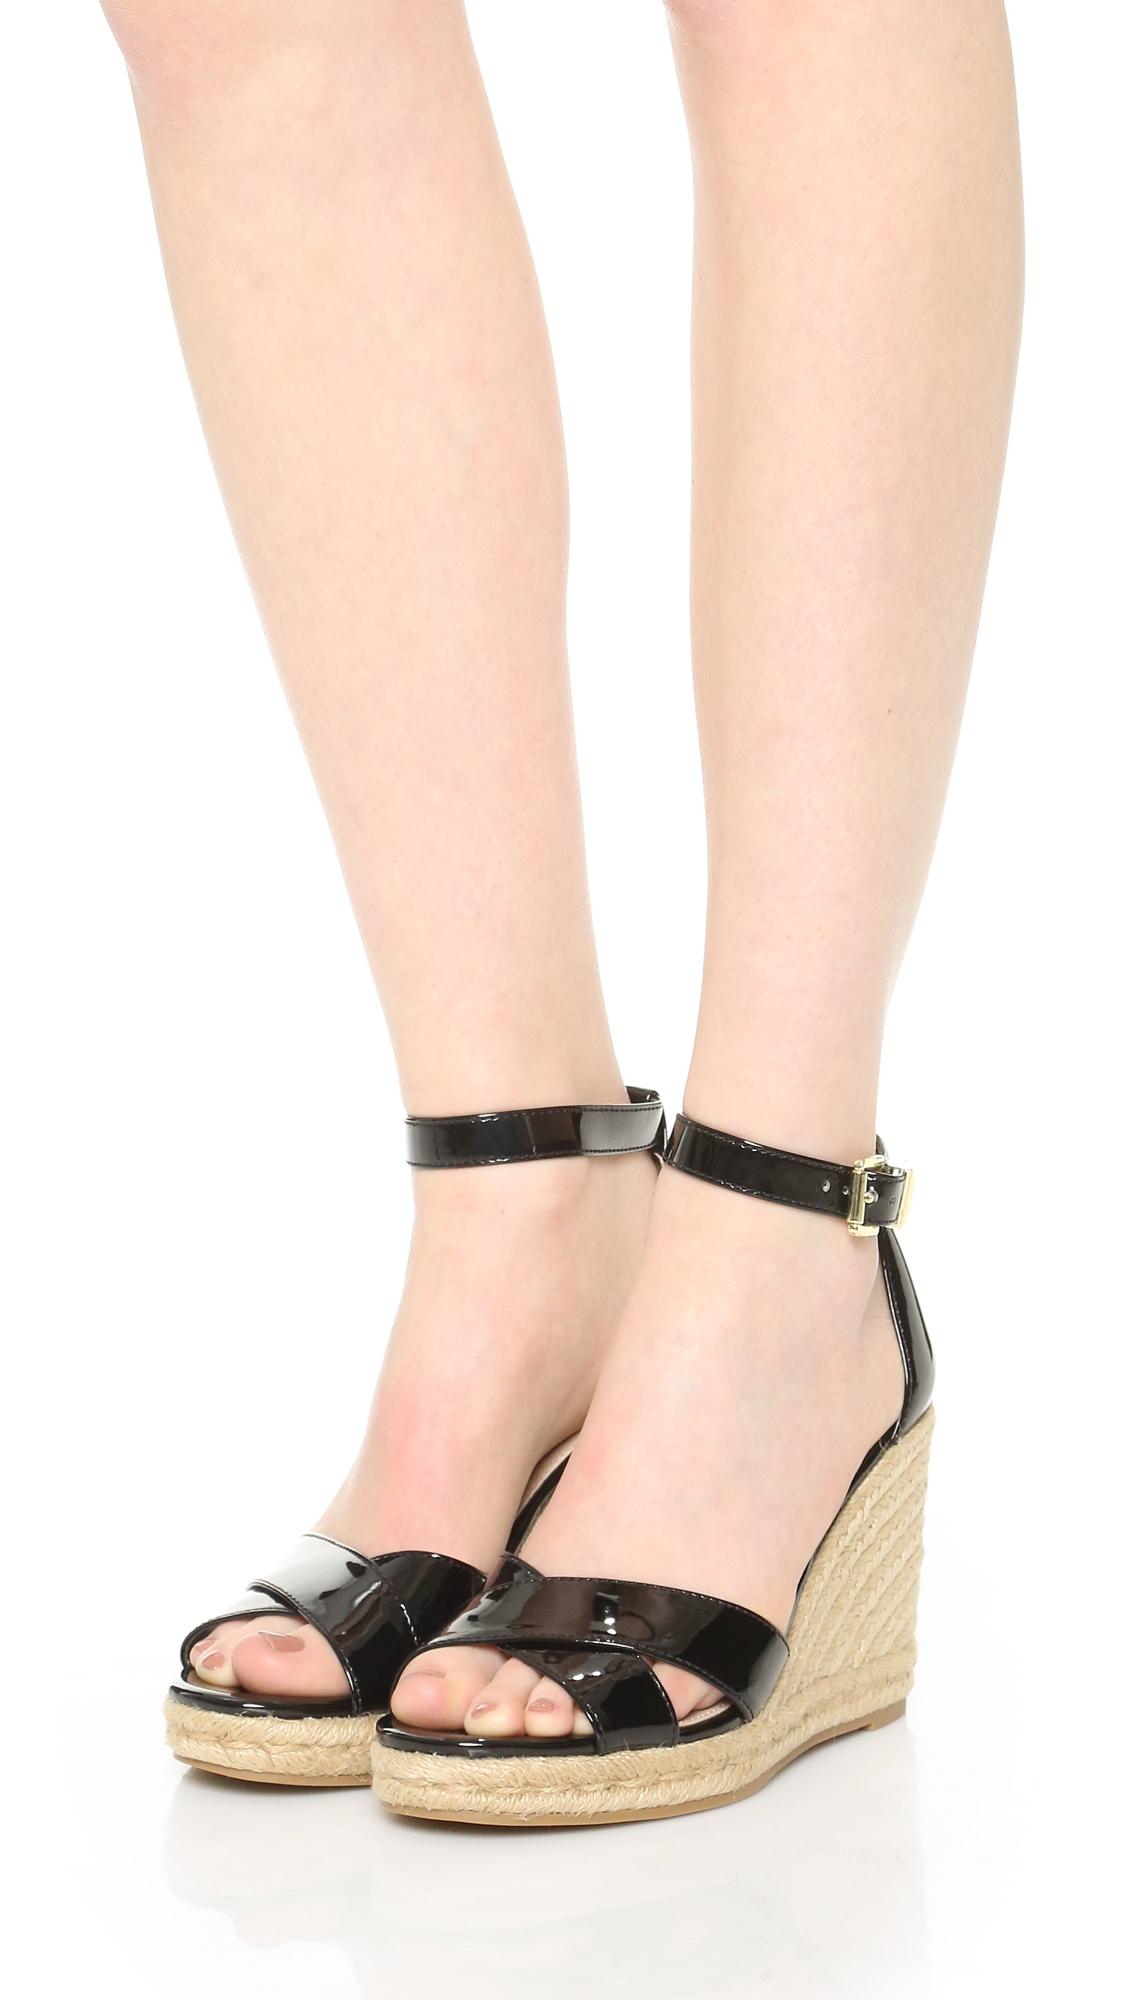 48fe5446ebc Lyst - Sam Edelman Brenda Espadrille Wedge Sandals in Black